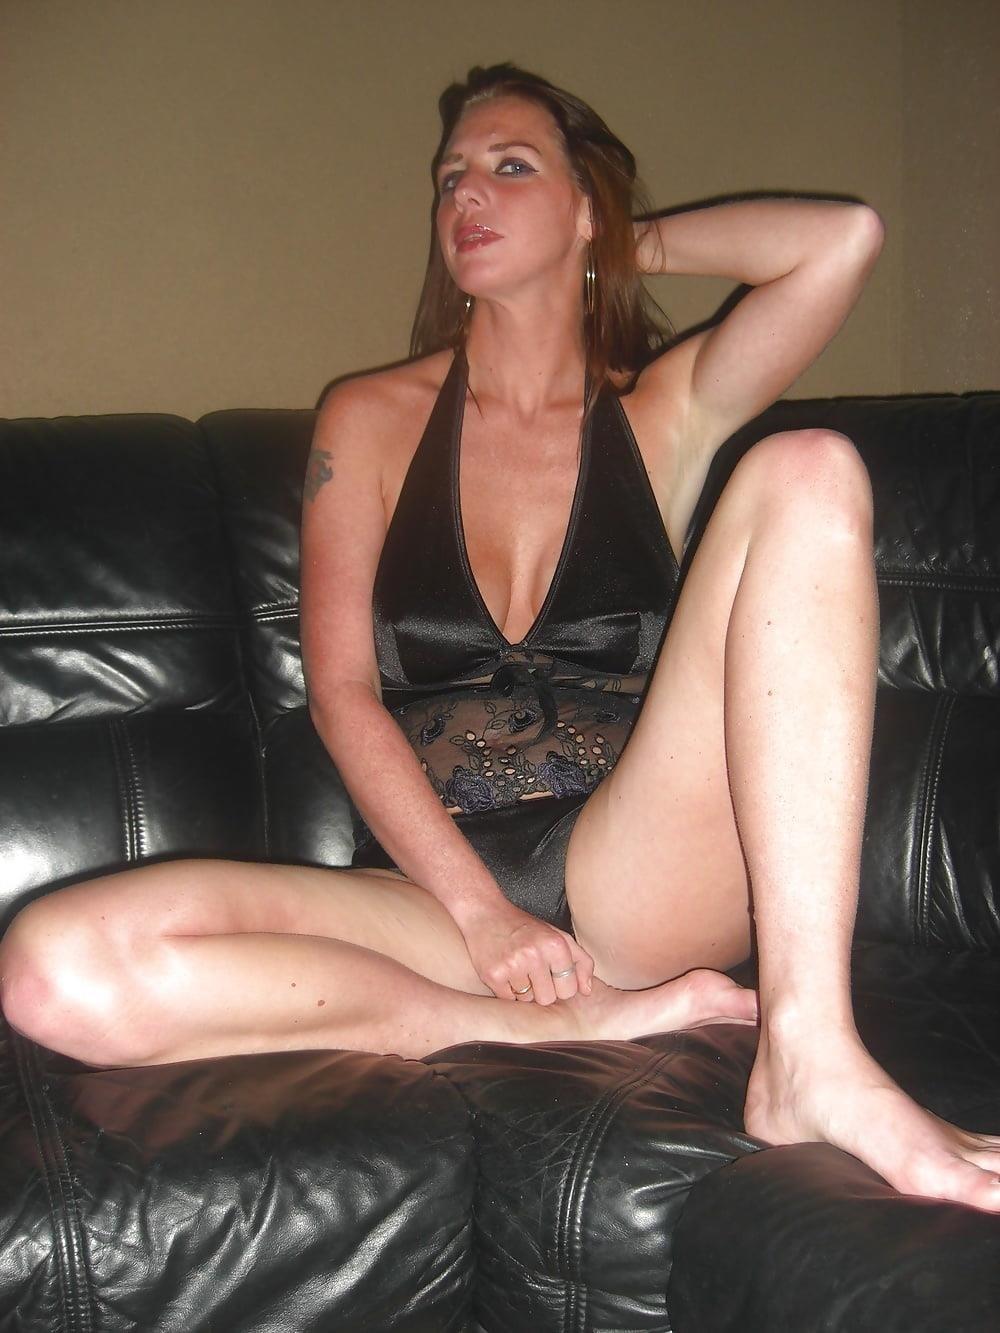 Big tit brunette pics-2198